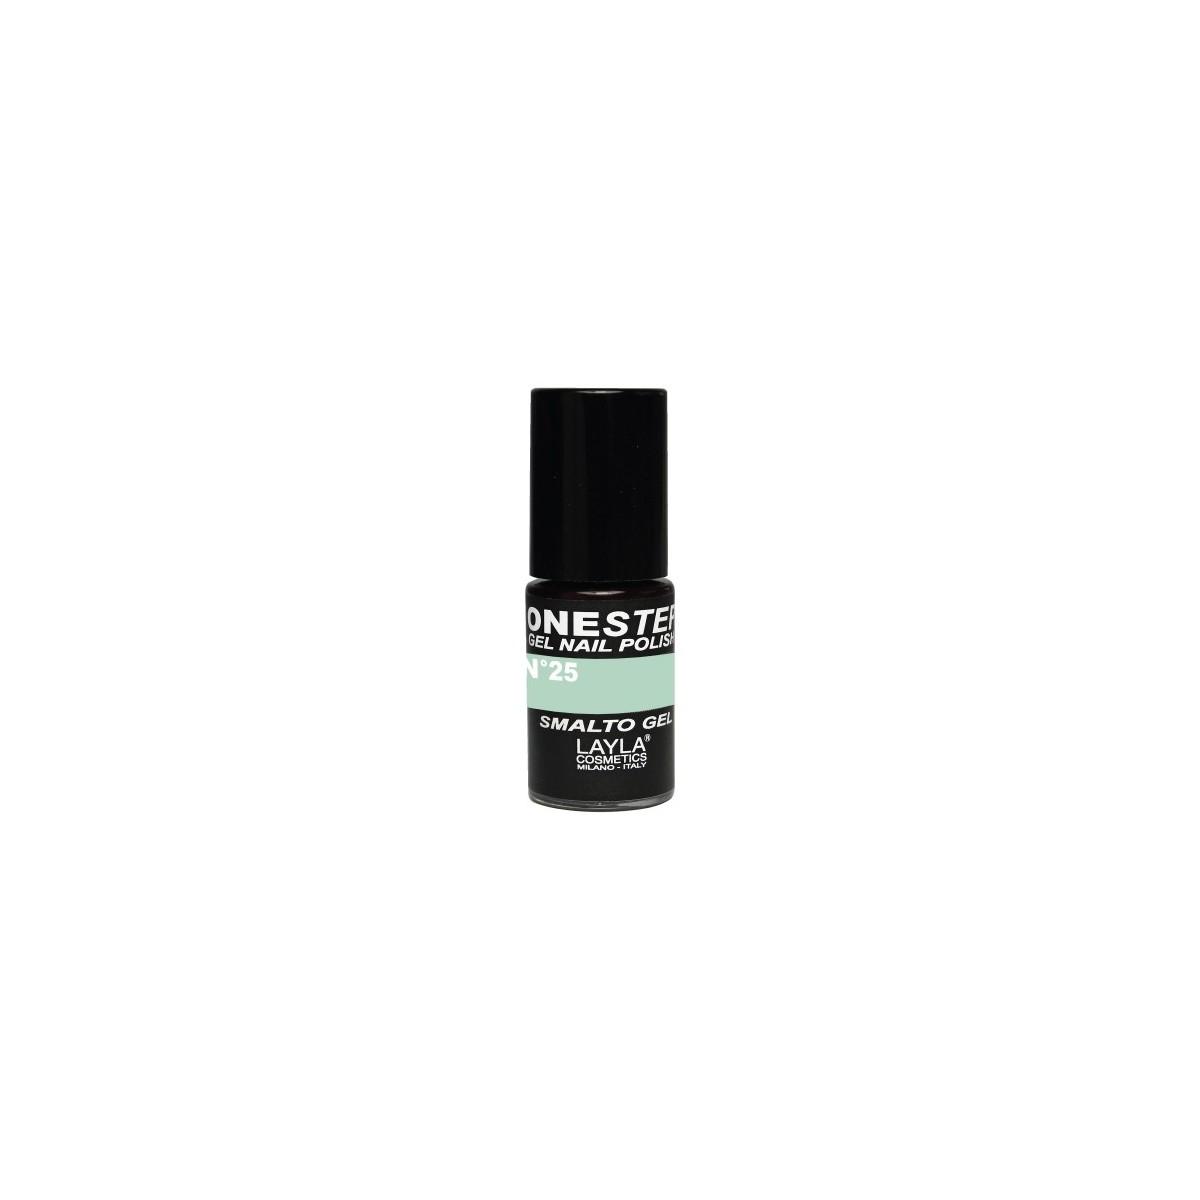 Vernis à ongles Lime Love Vert clair UV Gel One-step Layla 1